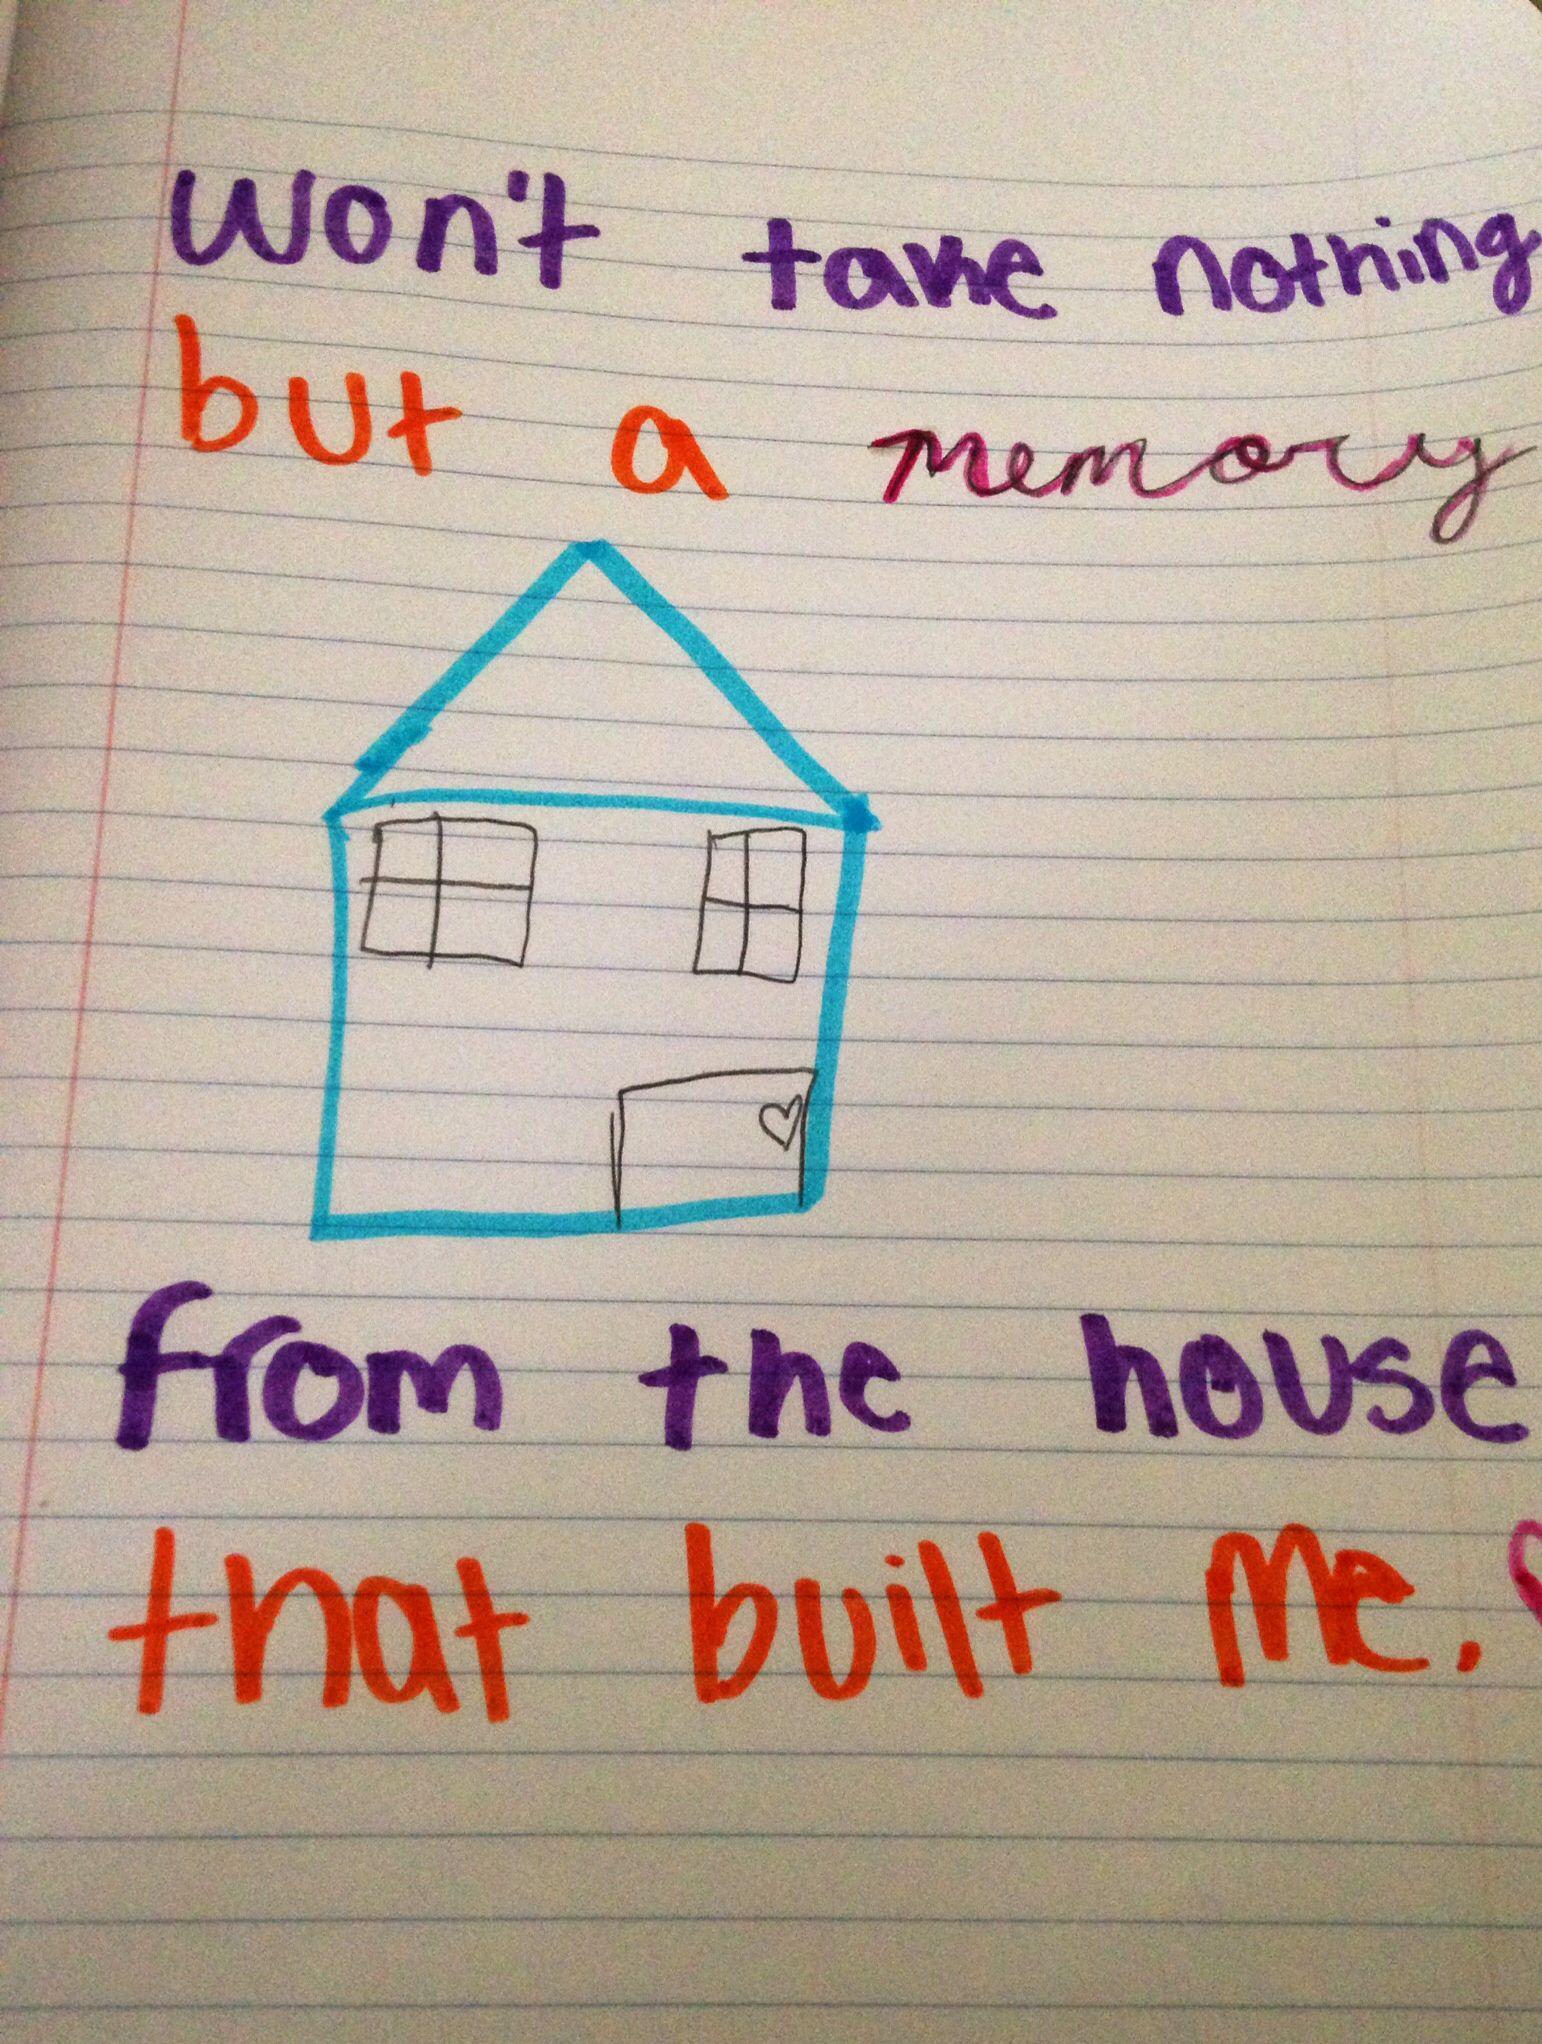 The House That Built Me Miranda Lambert lyrics